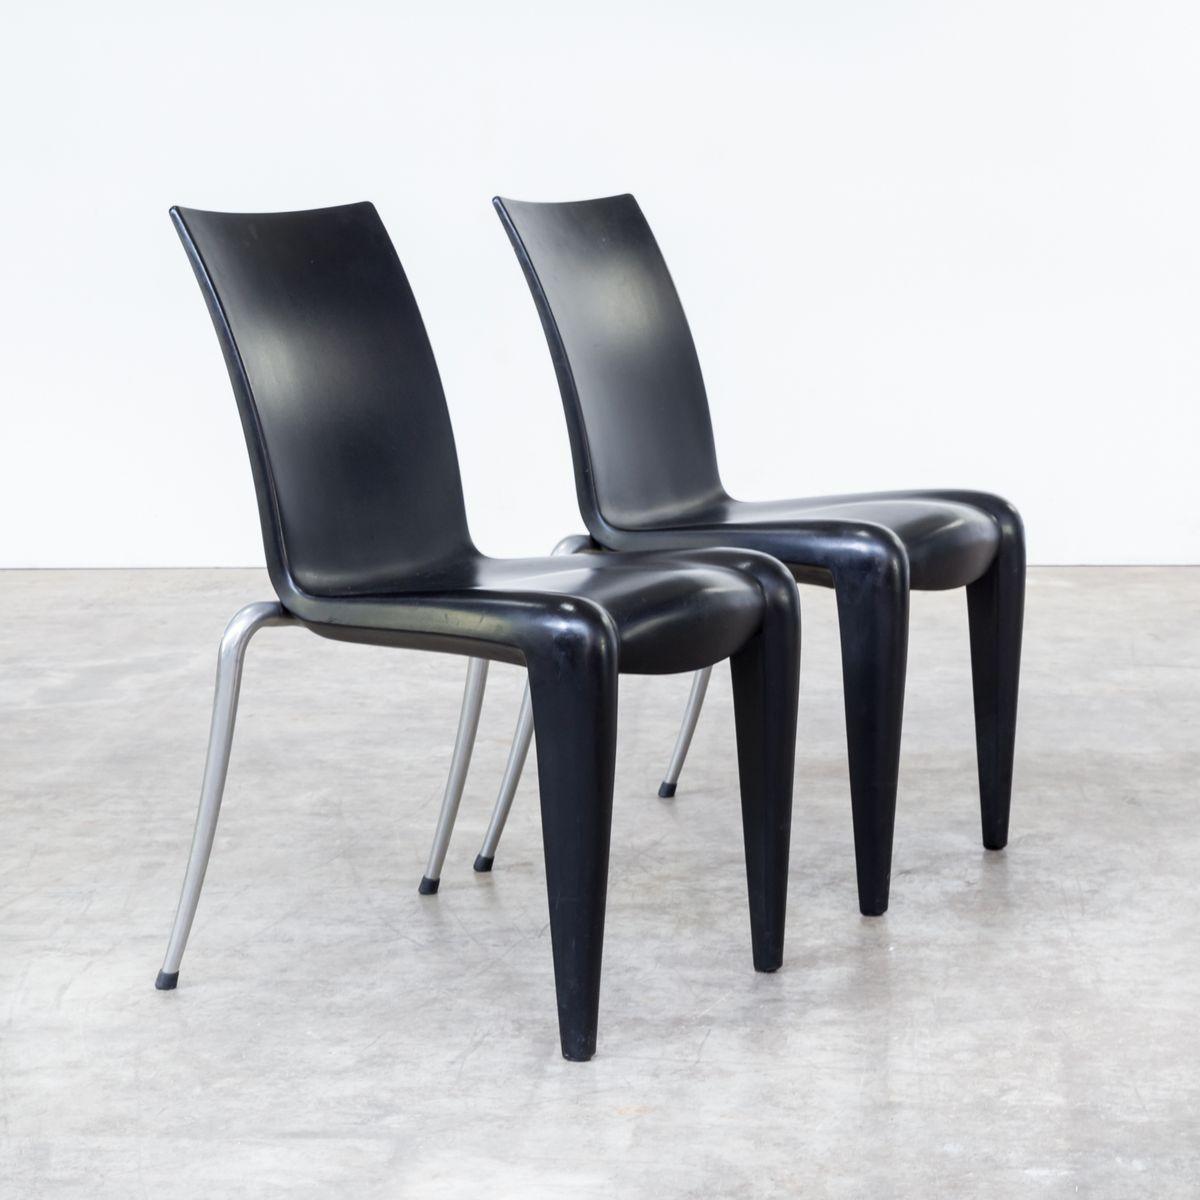 louis 20 st hle von philippe starck f r vitra 1990er 4er set bei pamono kaufen. Black Bedroom Furniture Sets. Home Design Ideas